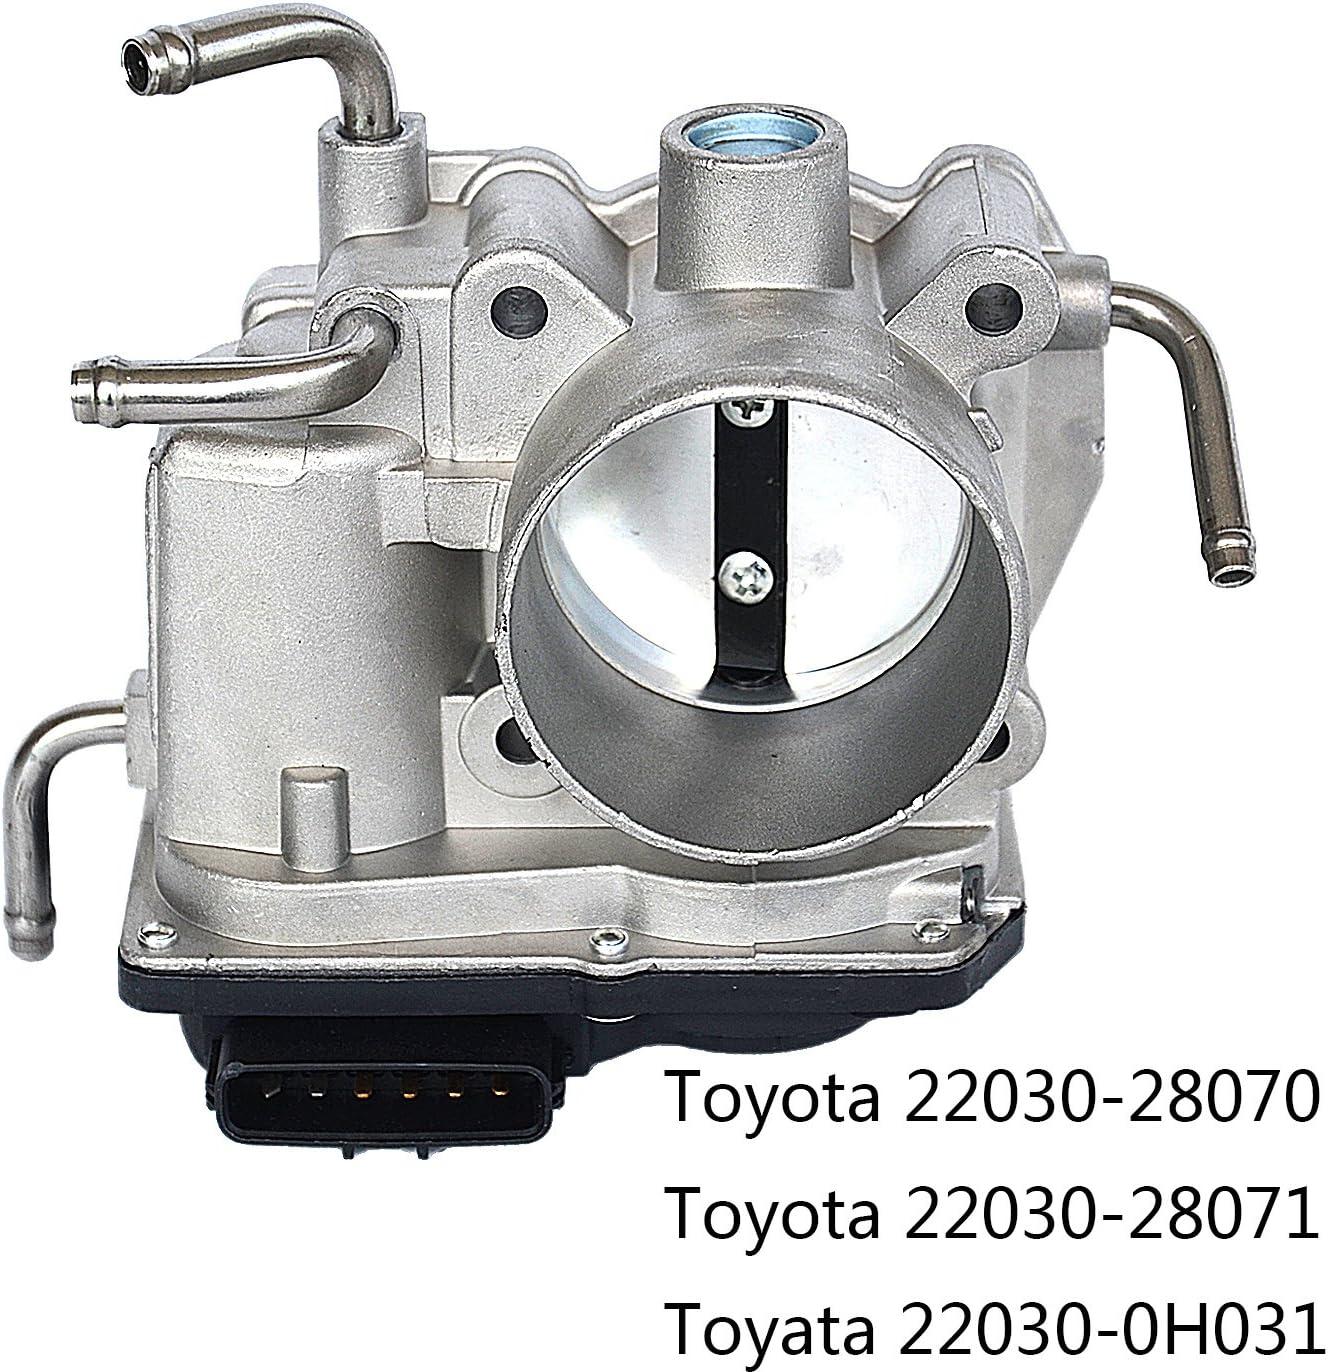 22030-28070 Throttle Body For Toyota Camry Scion RAV4 Matrix 2.4L